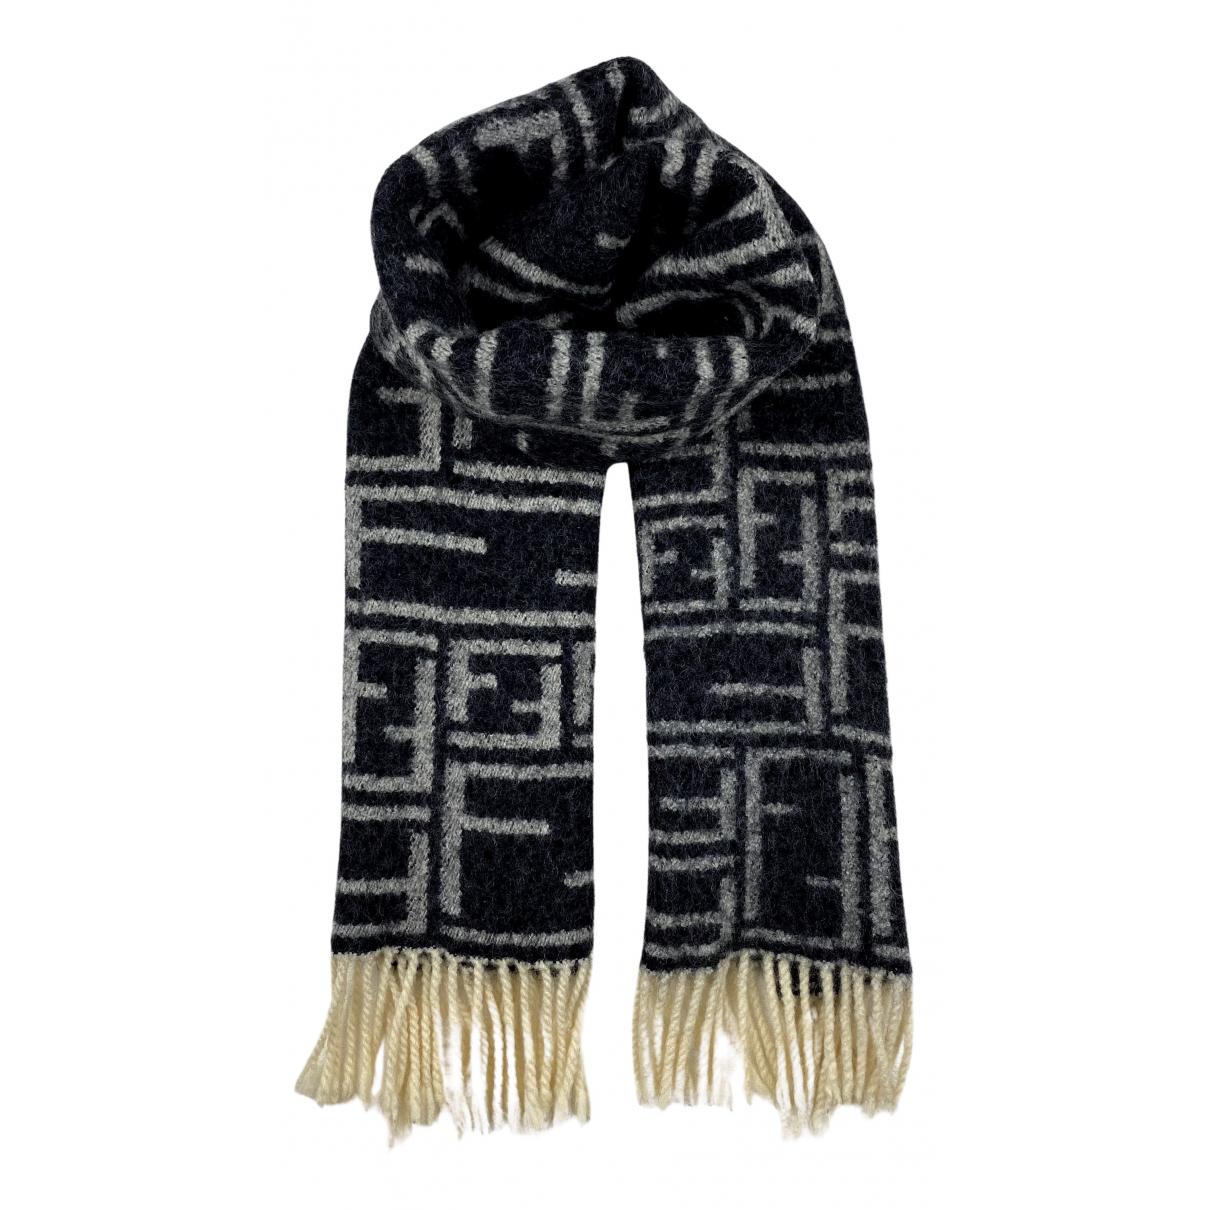 Fendi N Multicolour Wool scarf & pocket squares for Men N